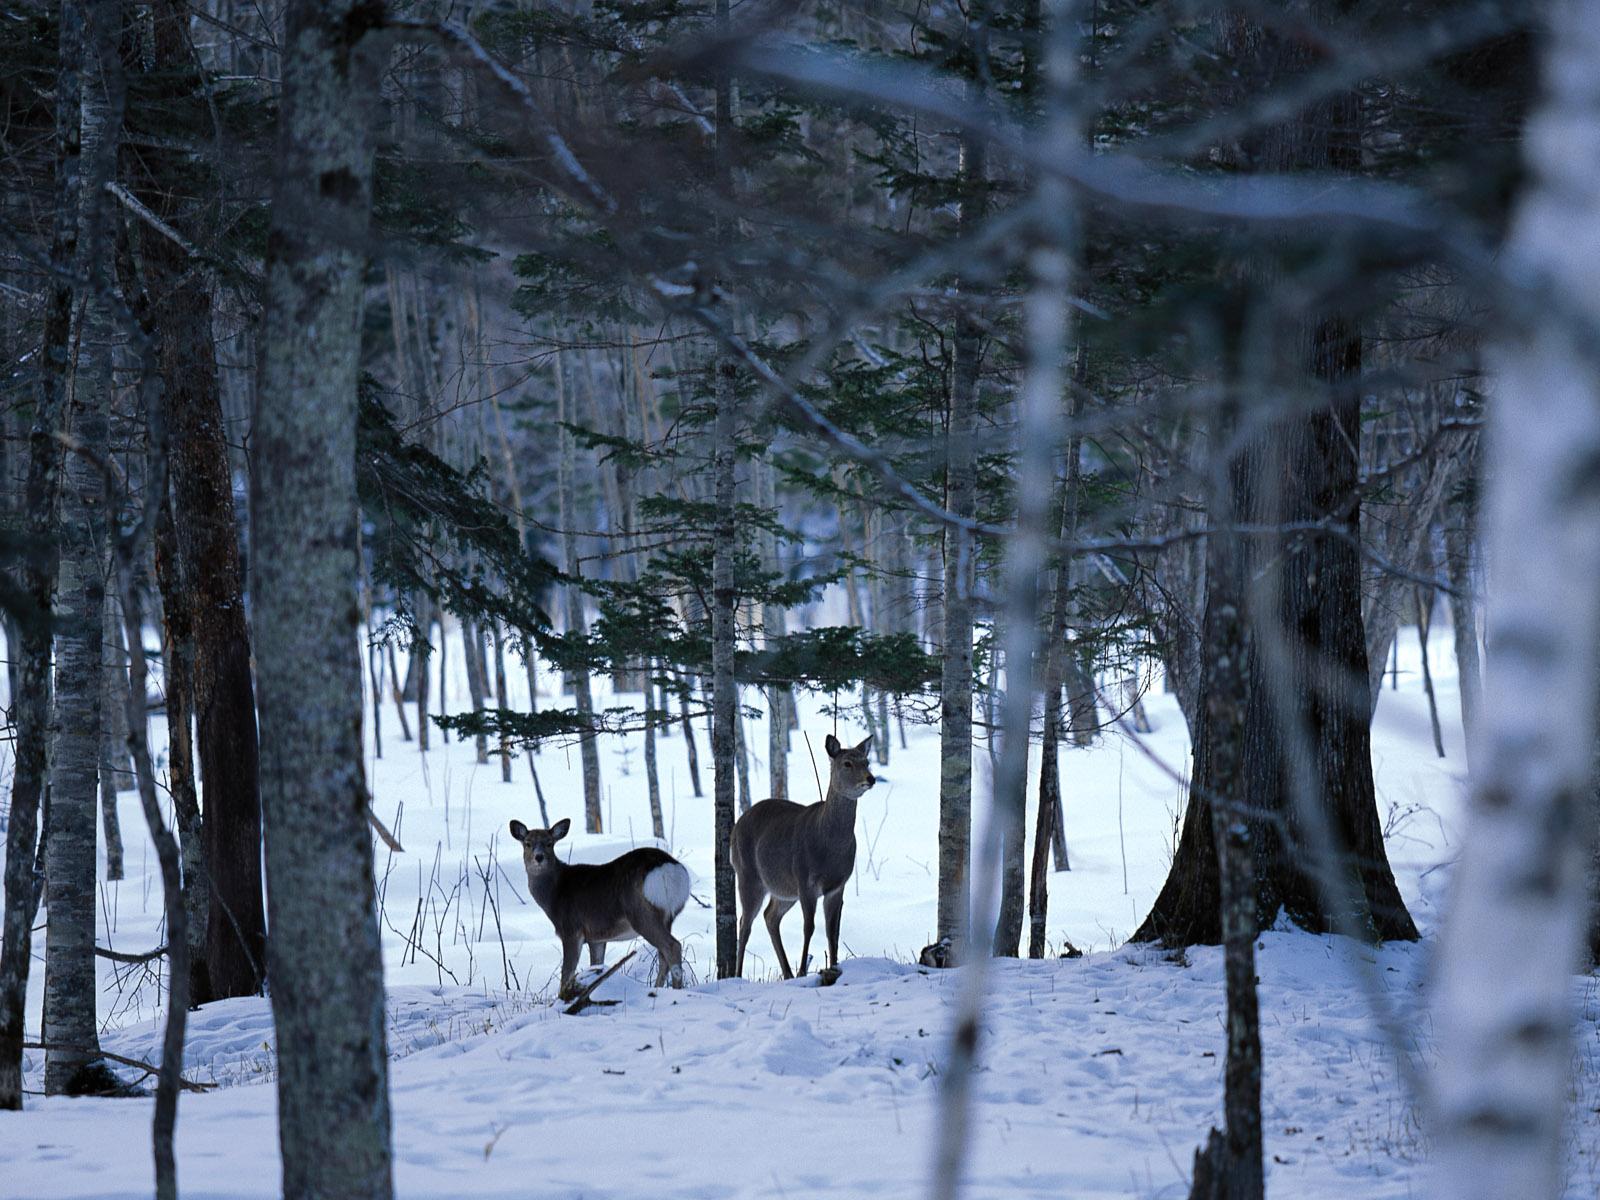 Snow Winter Scene winter snow wallpapers MIL50095 wallcoocomjpg 1600x1200